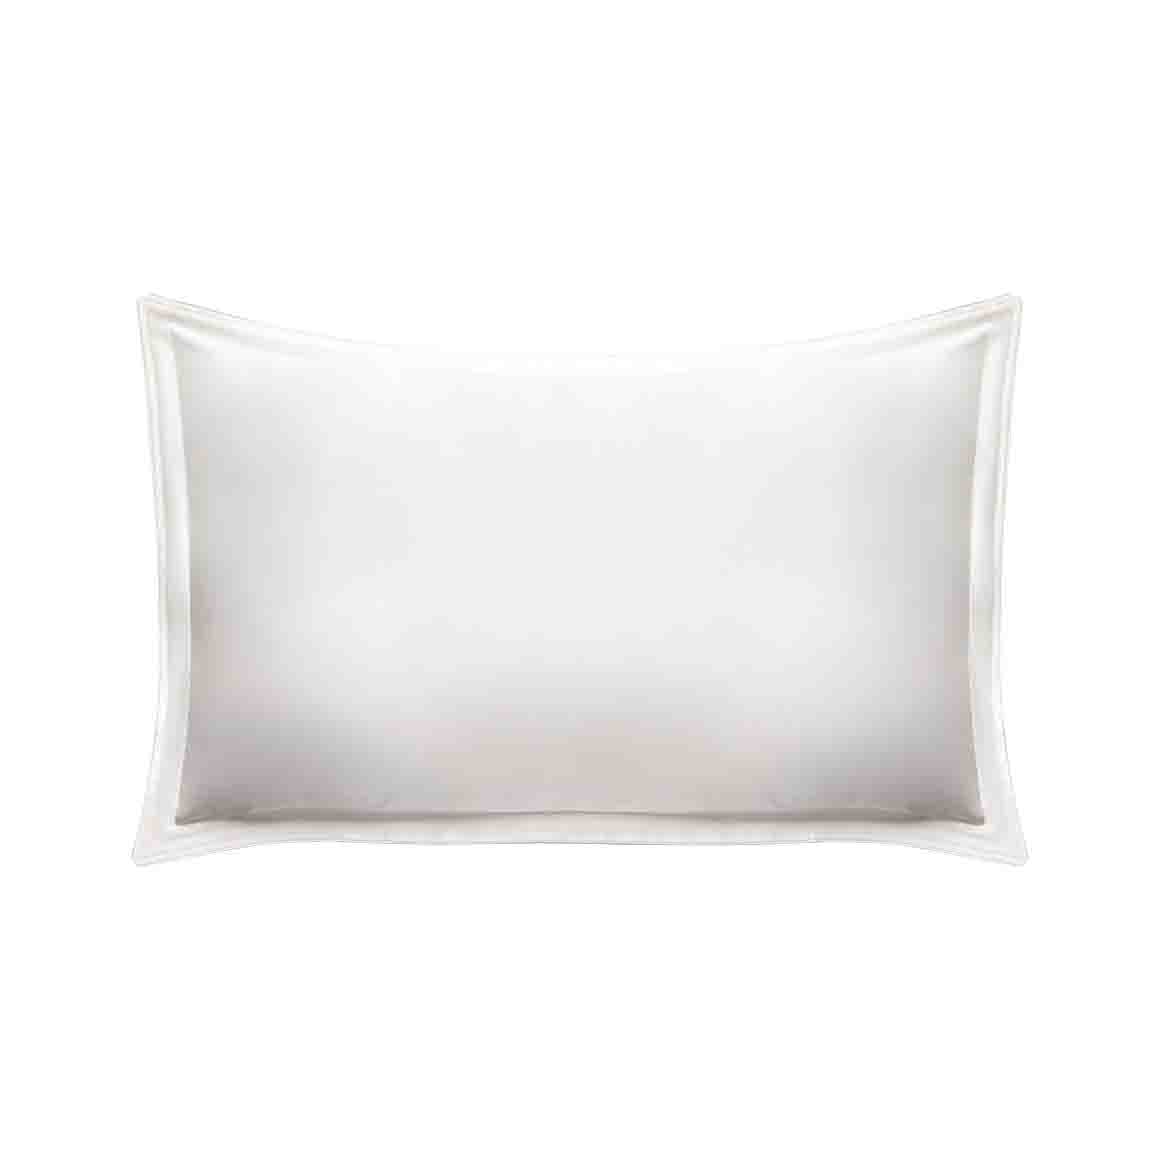 Latte Silk Pillowcase | Trada Marketplace